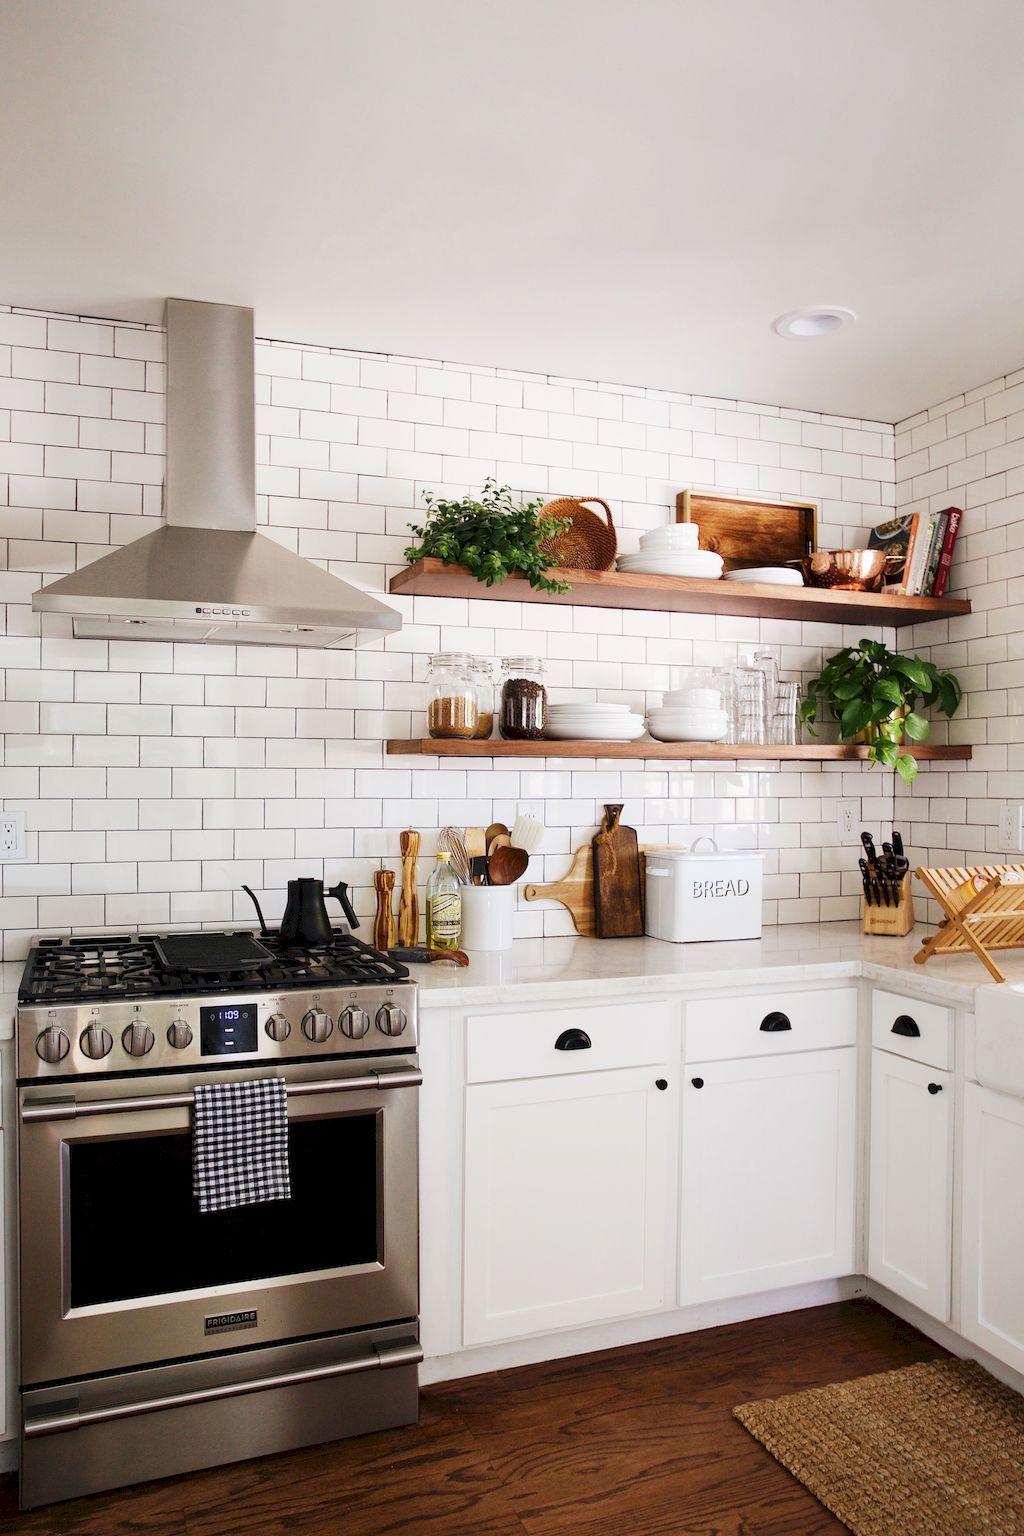 100 stunning farmhouse kitchen ideas on a budget 32 small kitchen renovations kitchen on kitchen ideas on a budget id=50101